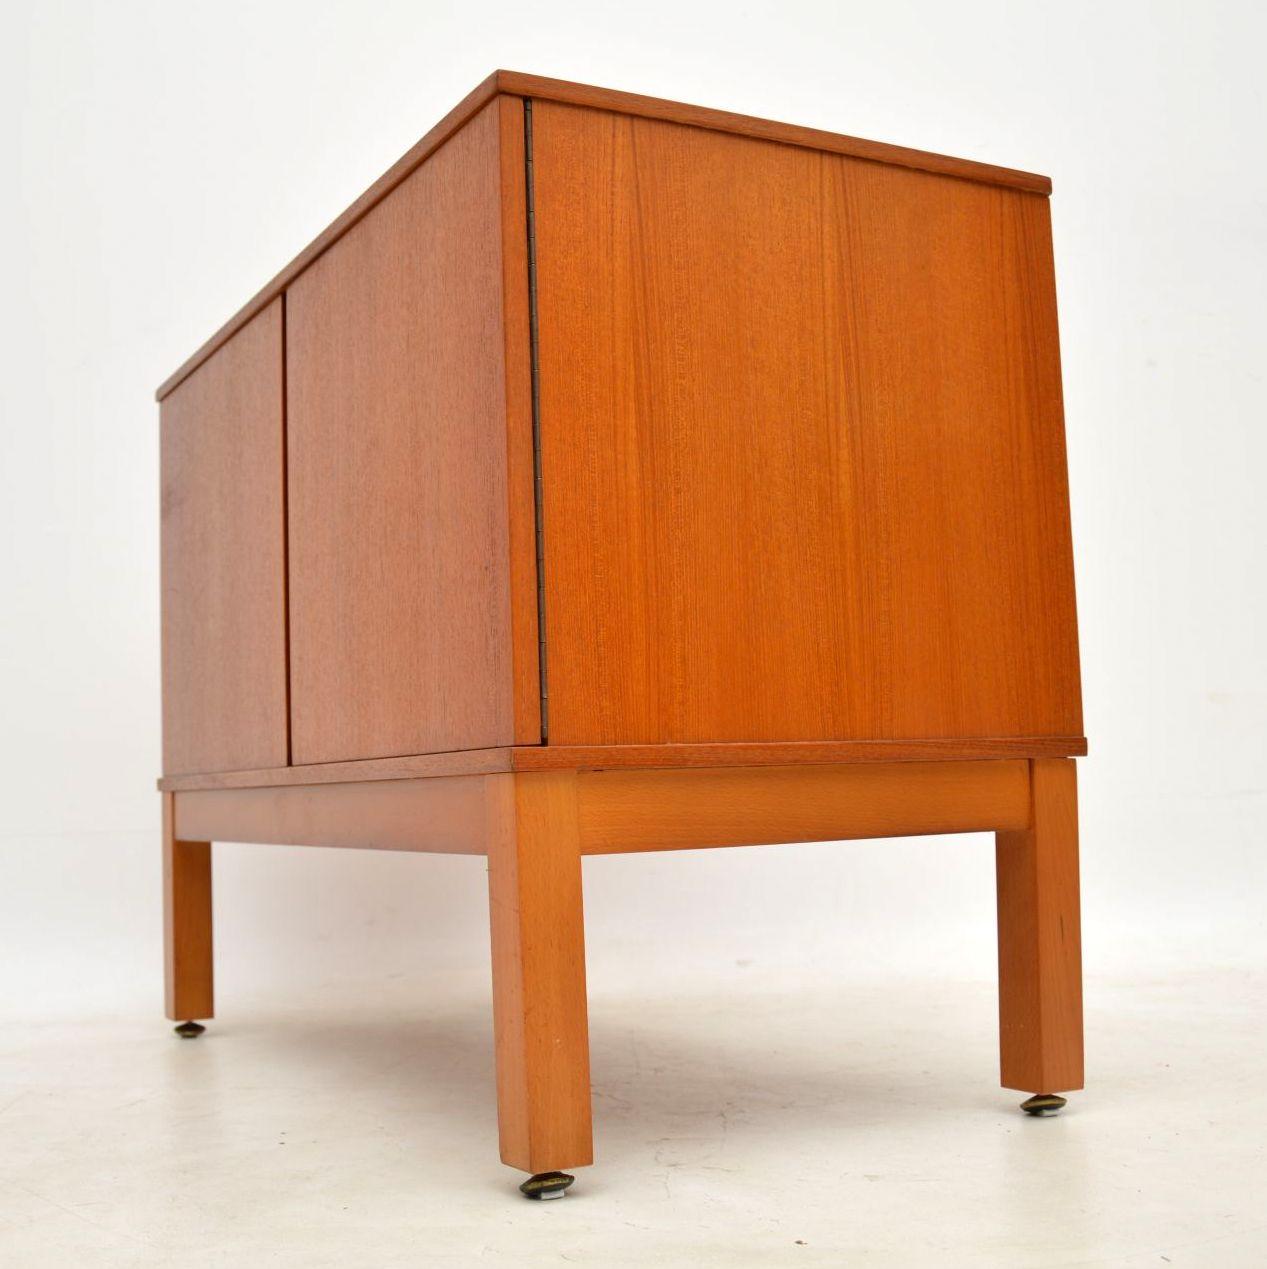 1970 S Vintage Teak Record Cabinet Retrospective